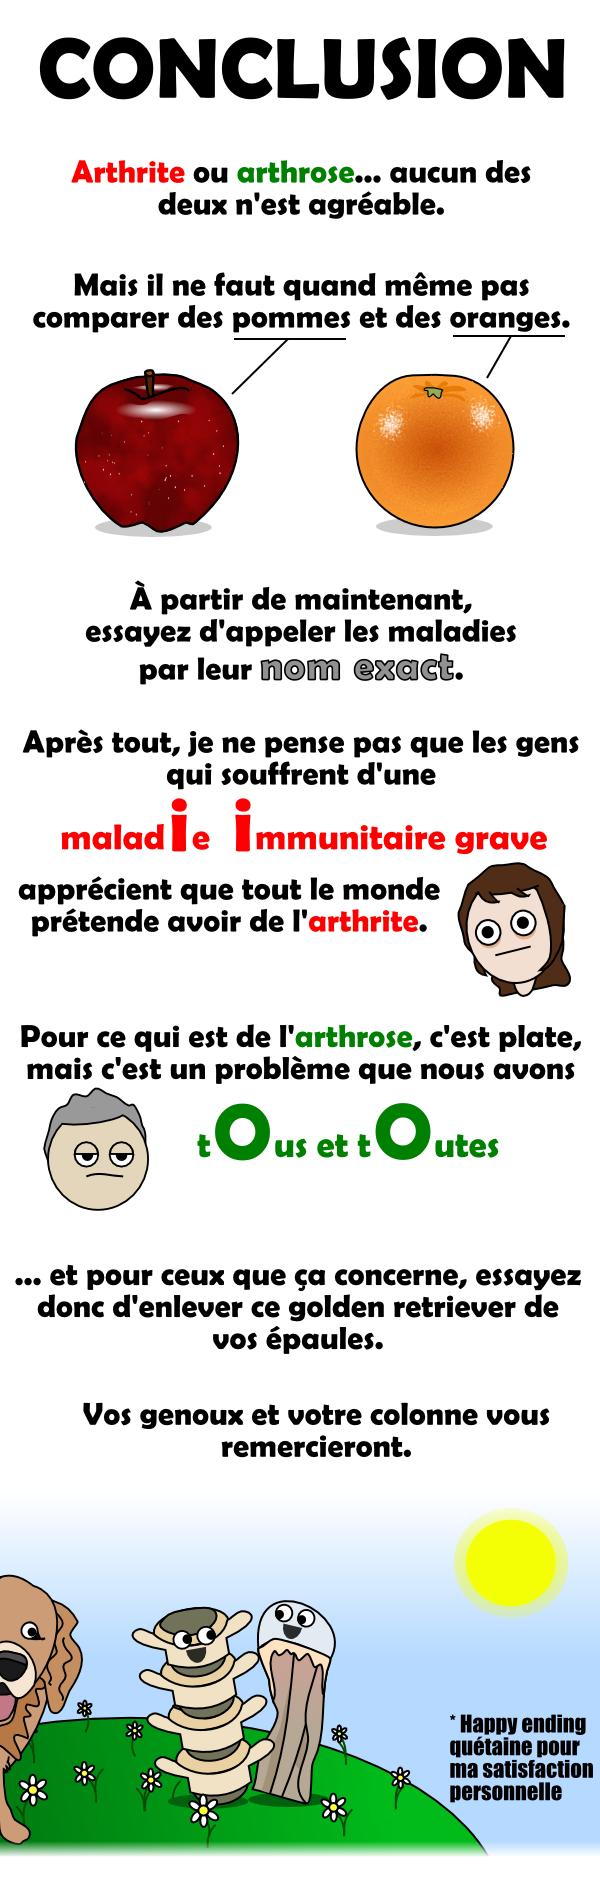 psoriasis definition francais